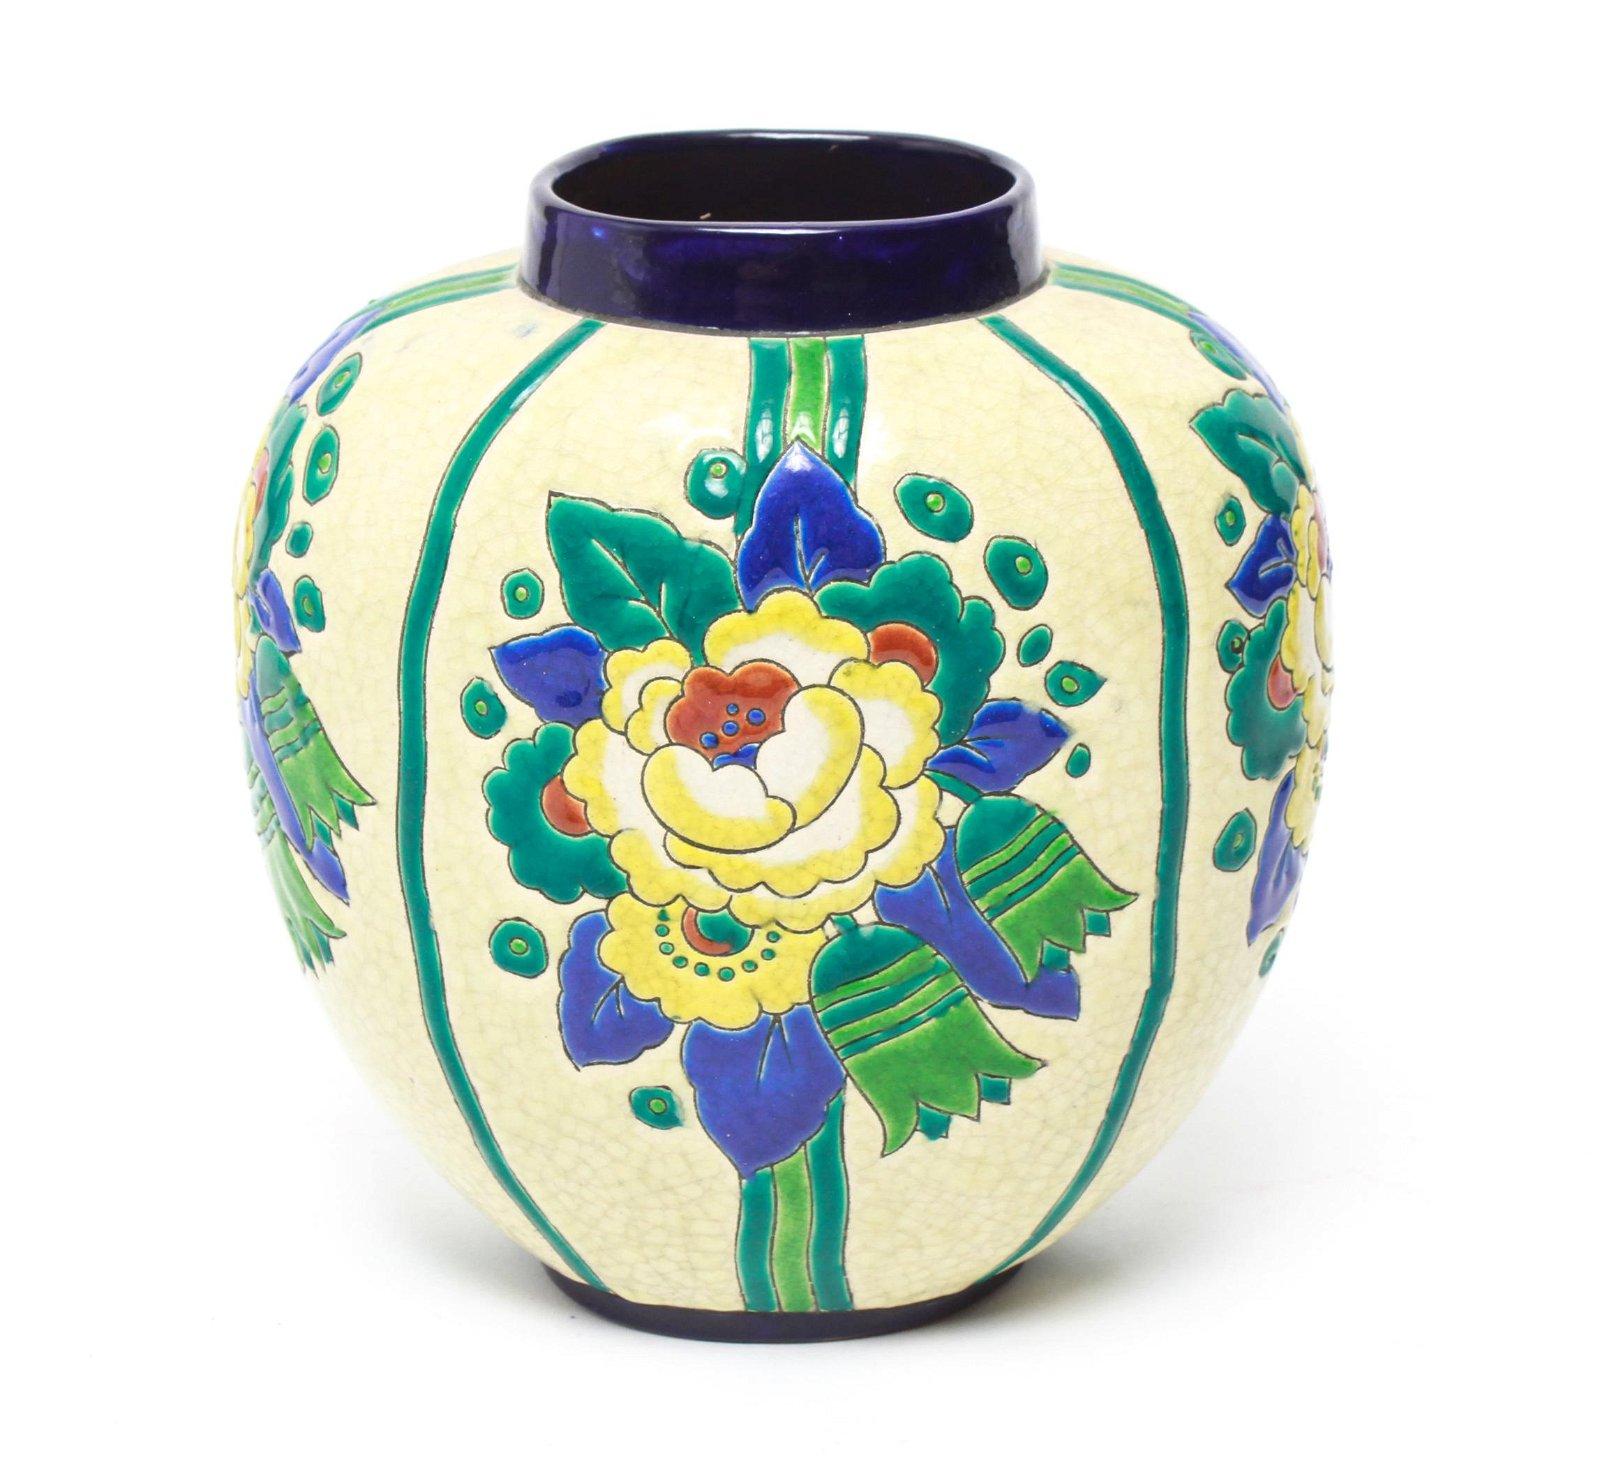 Art Deco Boch Freres Belgium Floral Pottery Vase